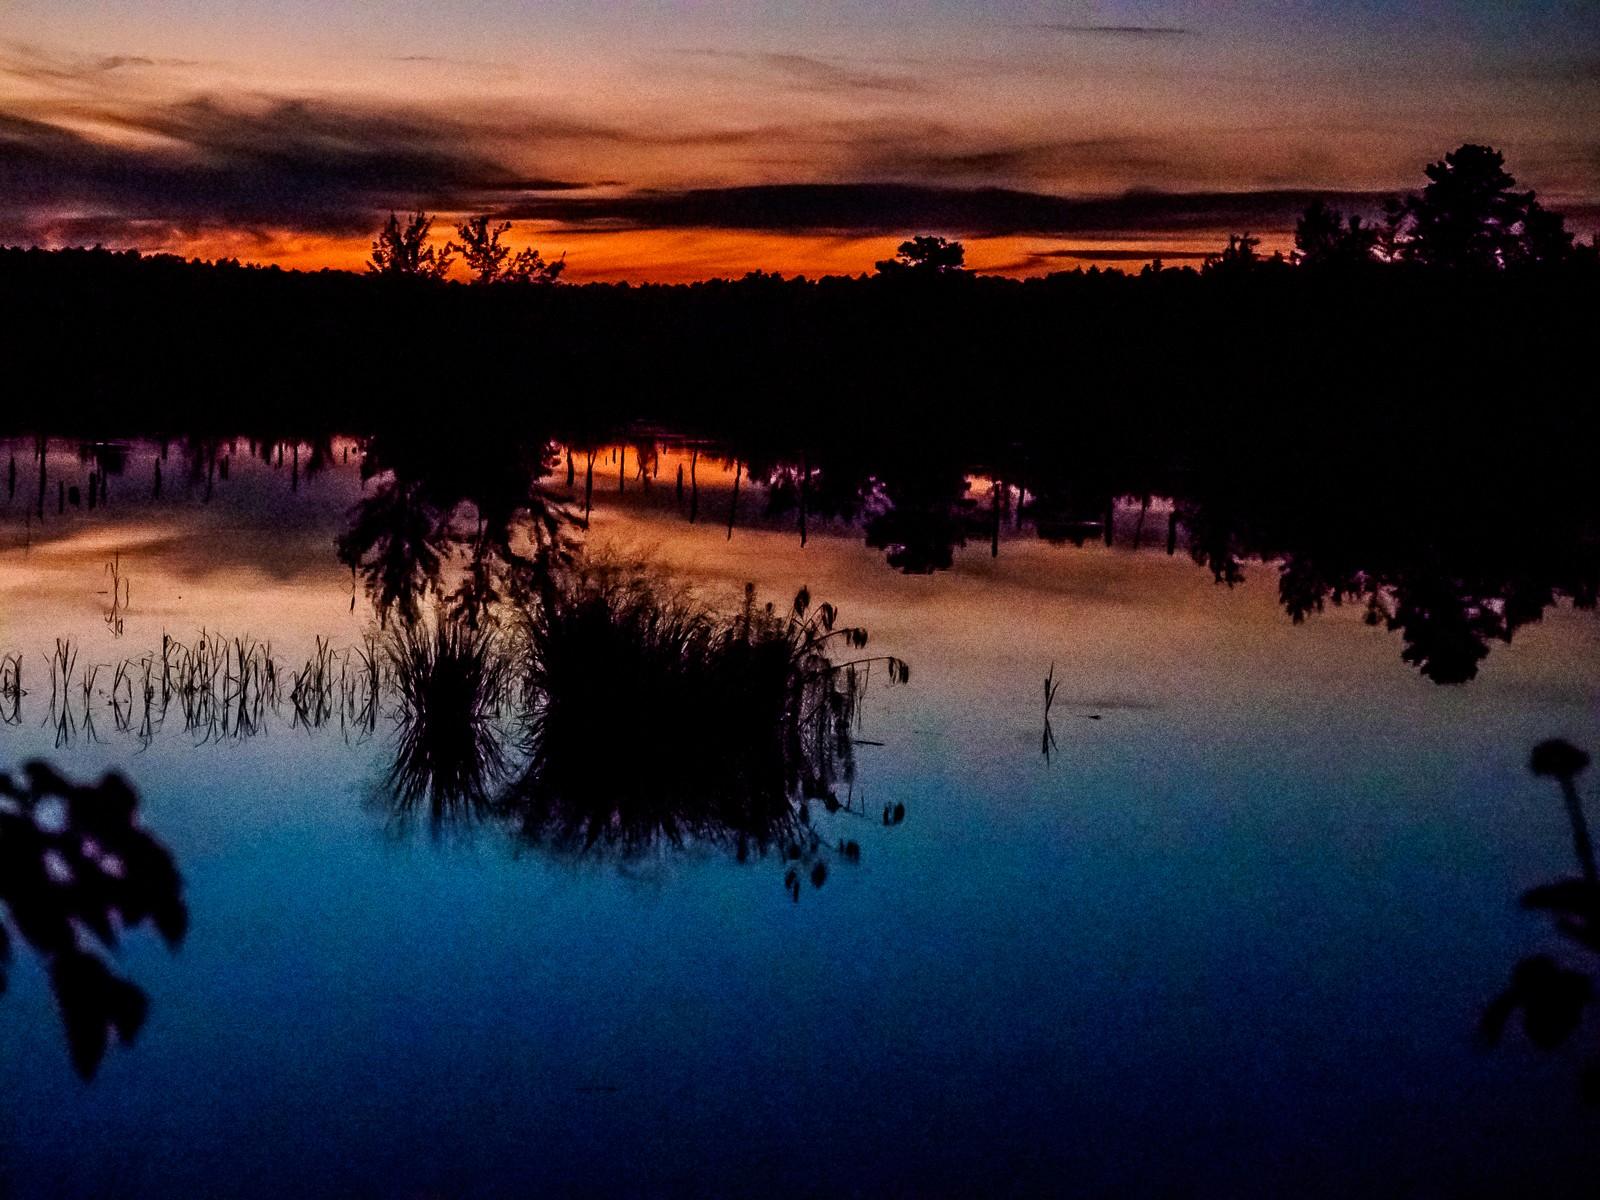 sunset-6655